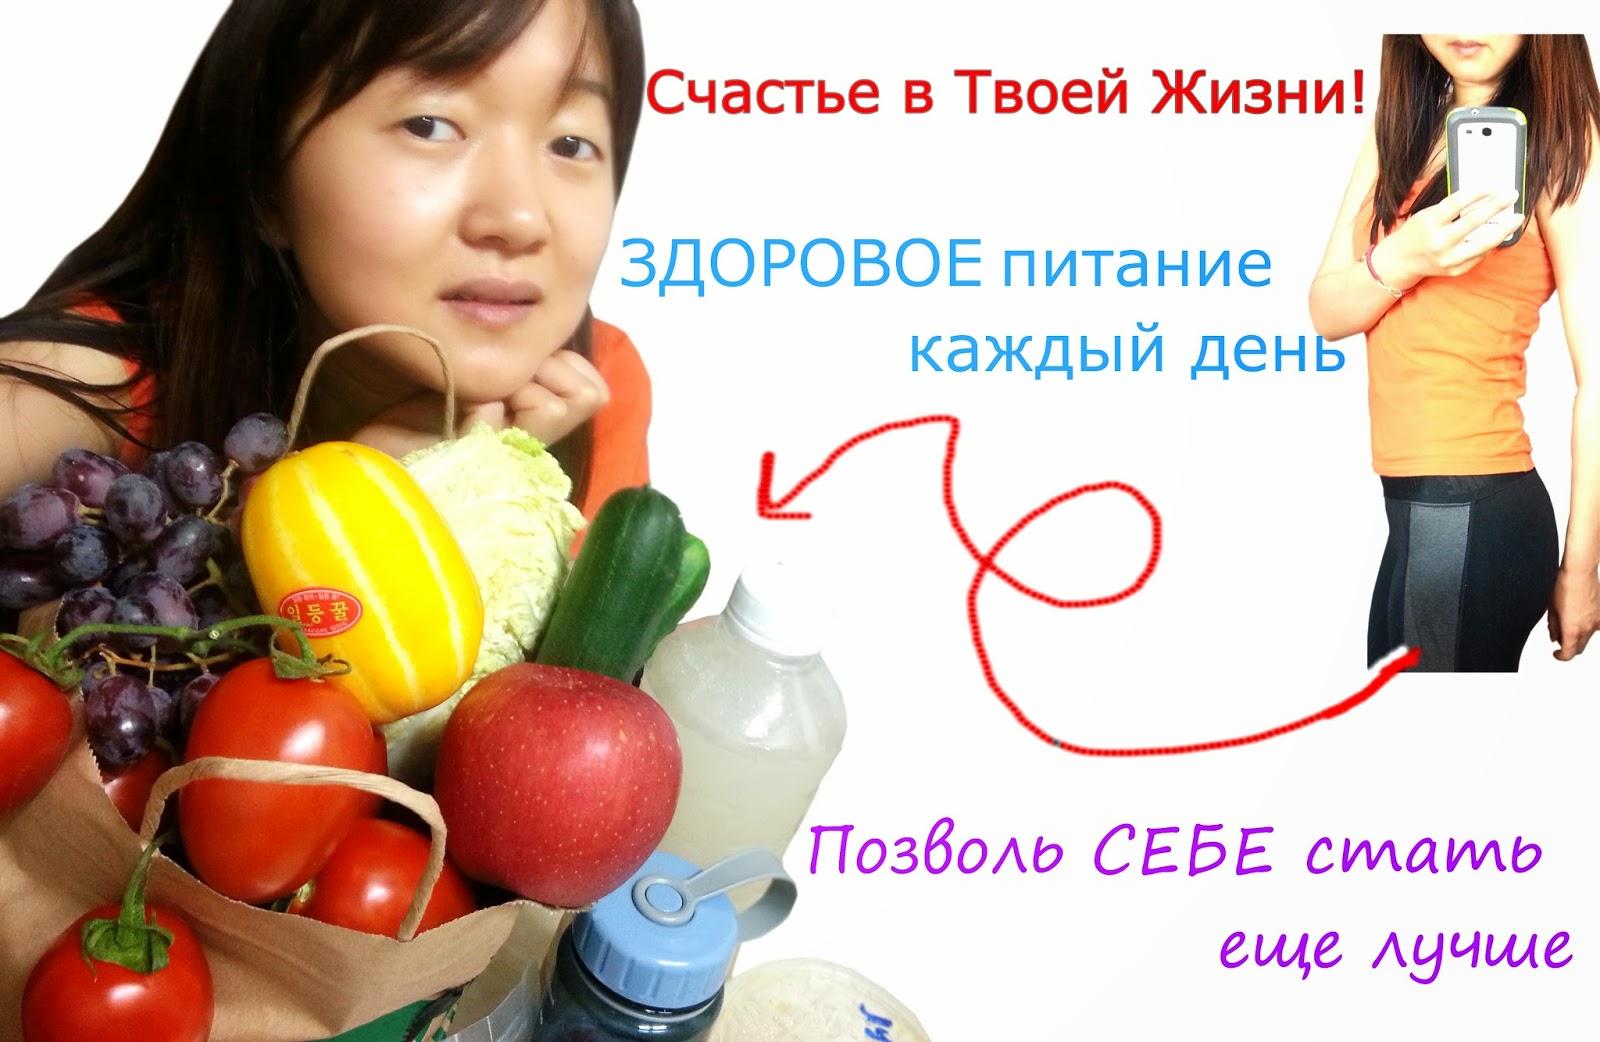 http://www.zoyaslookbook.com/2014/05/blog-post.html